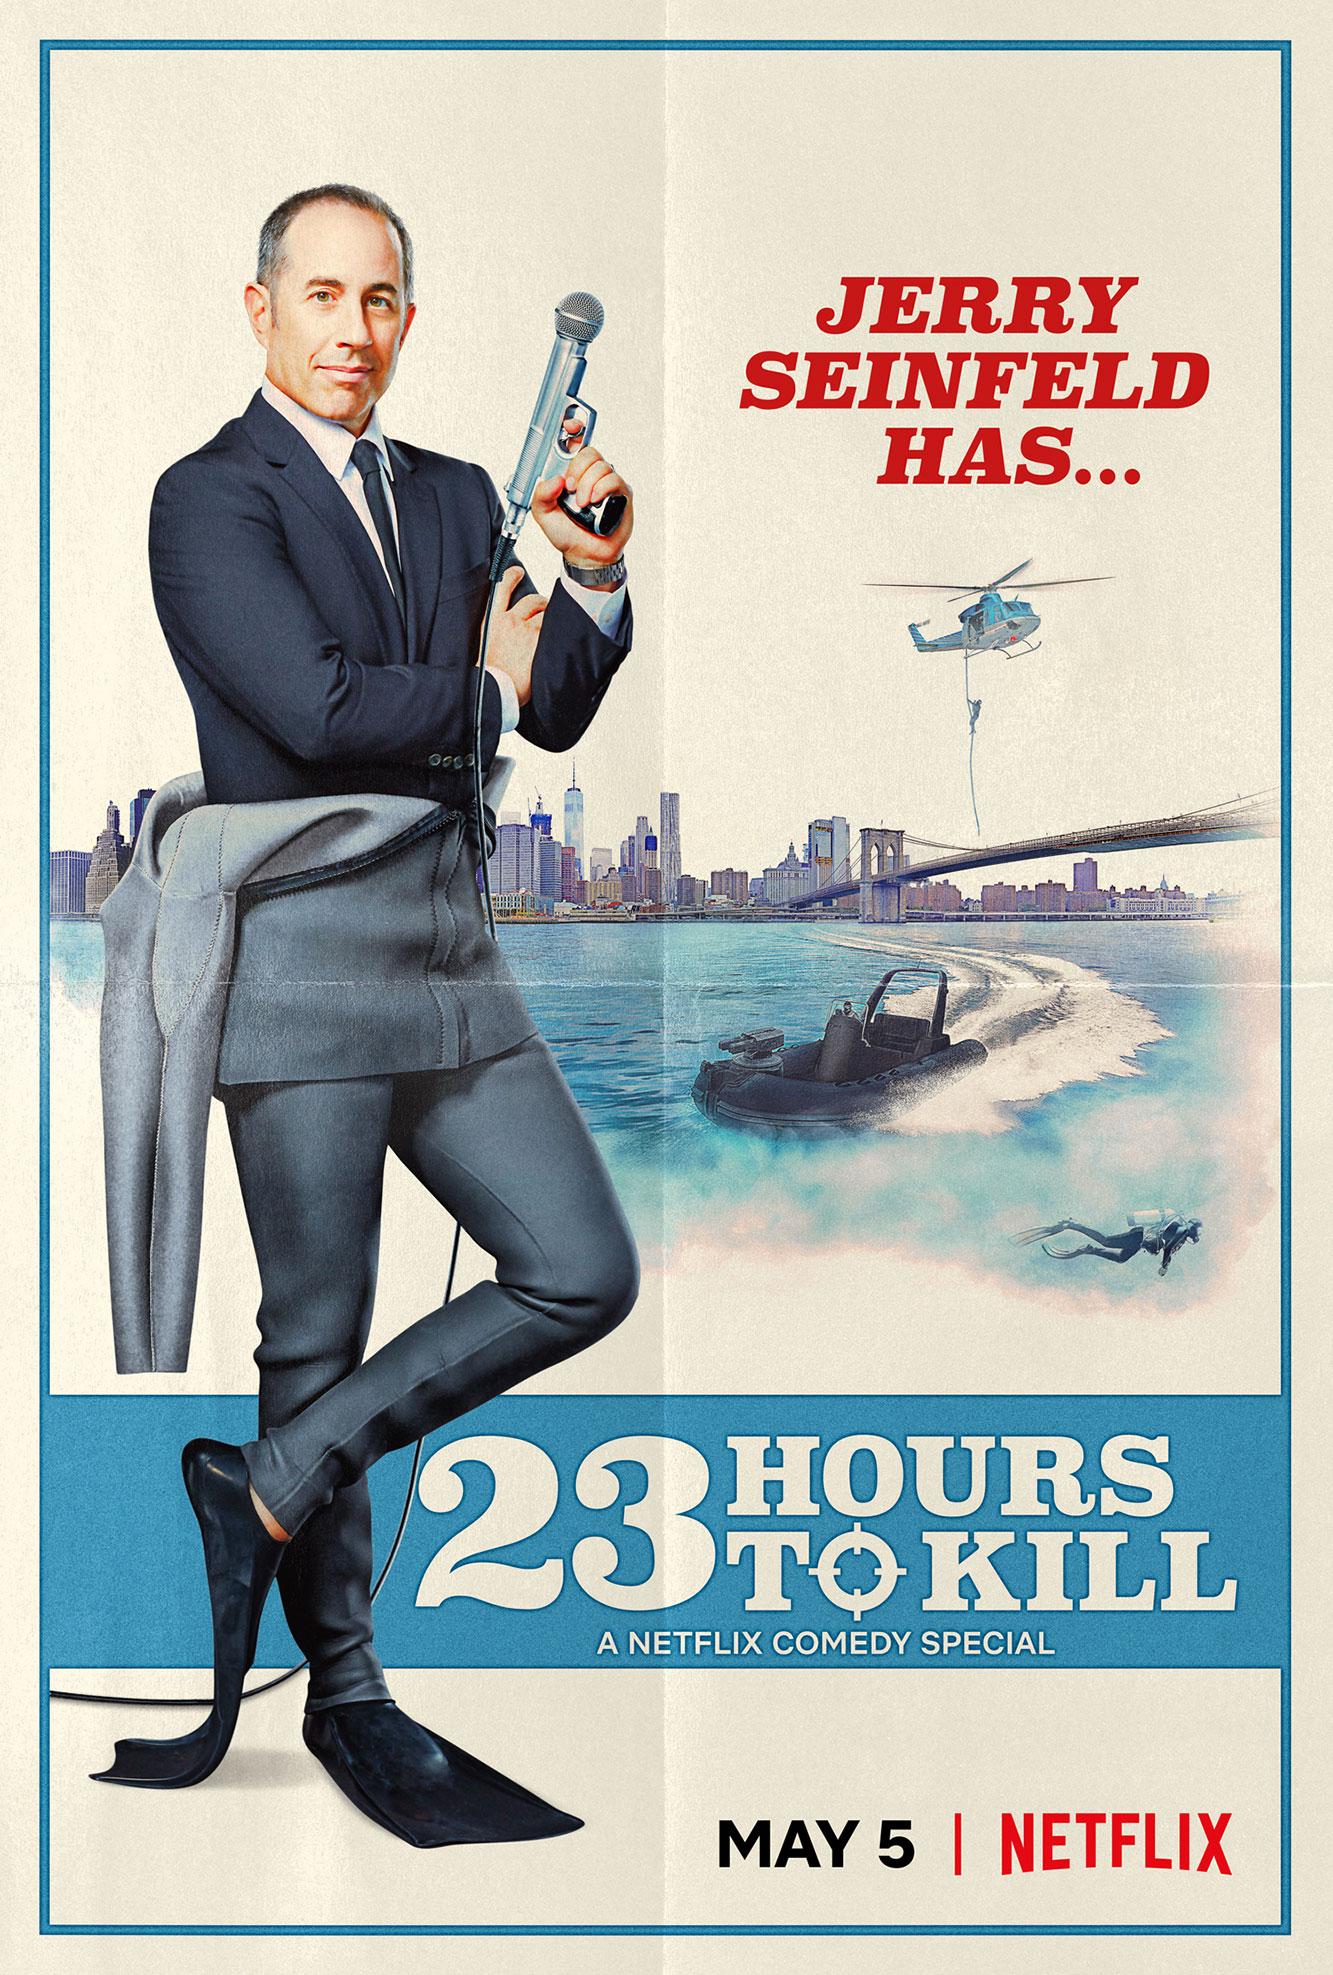 Jerry Seinfeld has 23 Hours to Kill